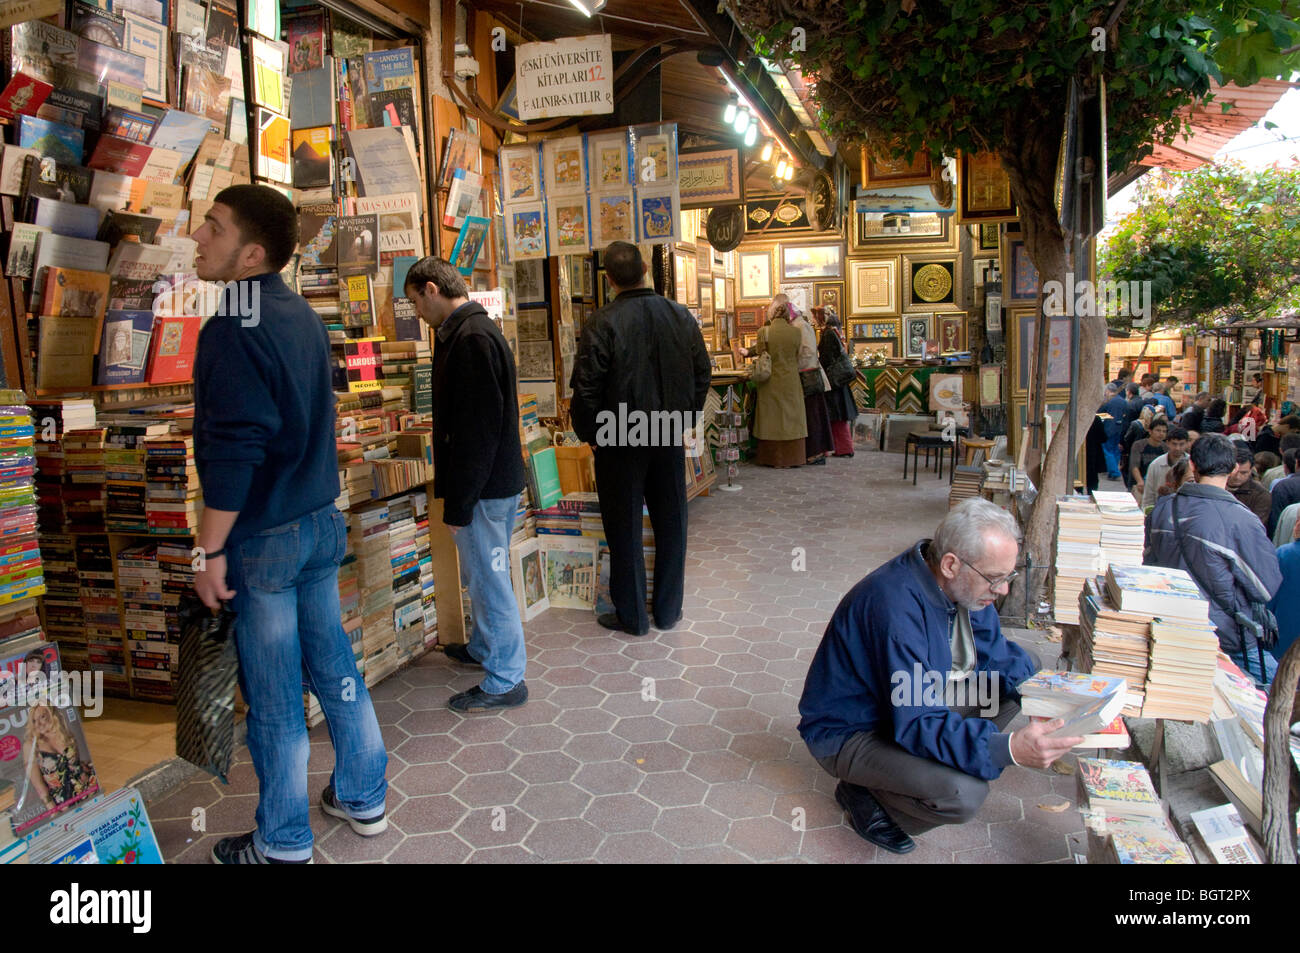 outside book shop stock photos outside book shop stock images alamy. Black Bedroom Furniture Sets. Home Design Ideas